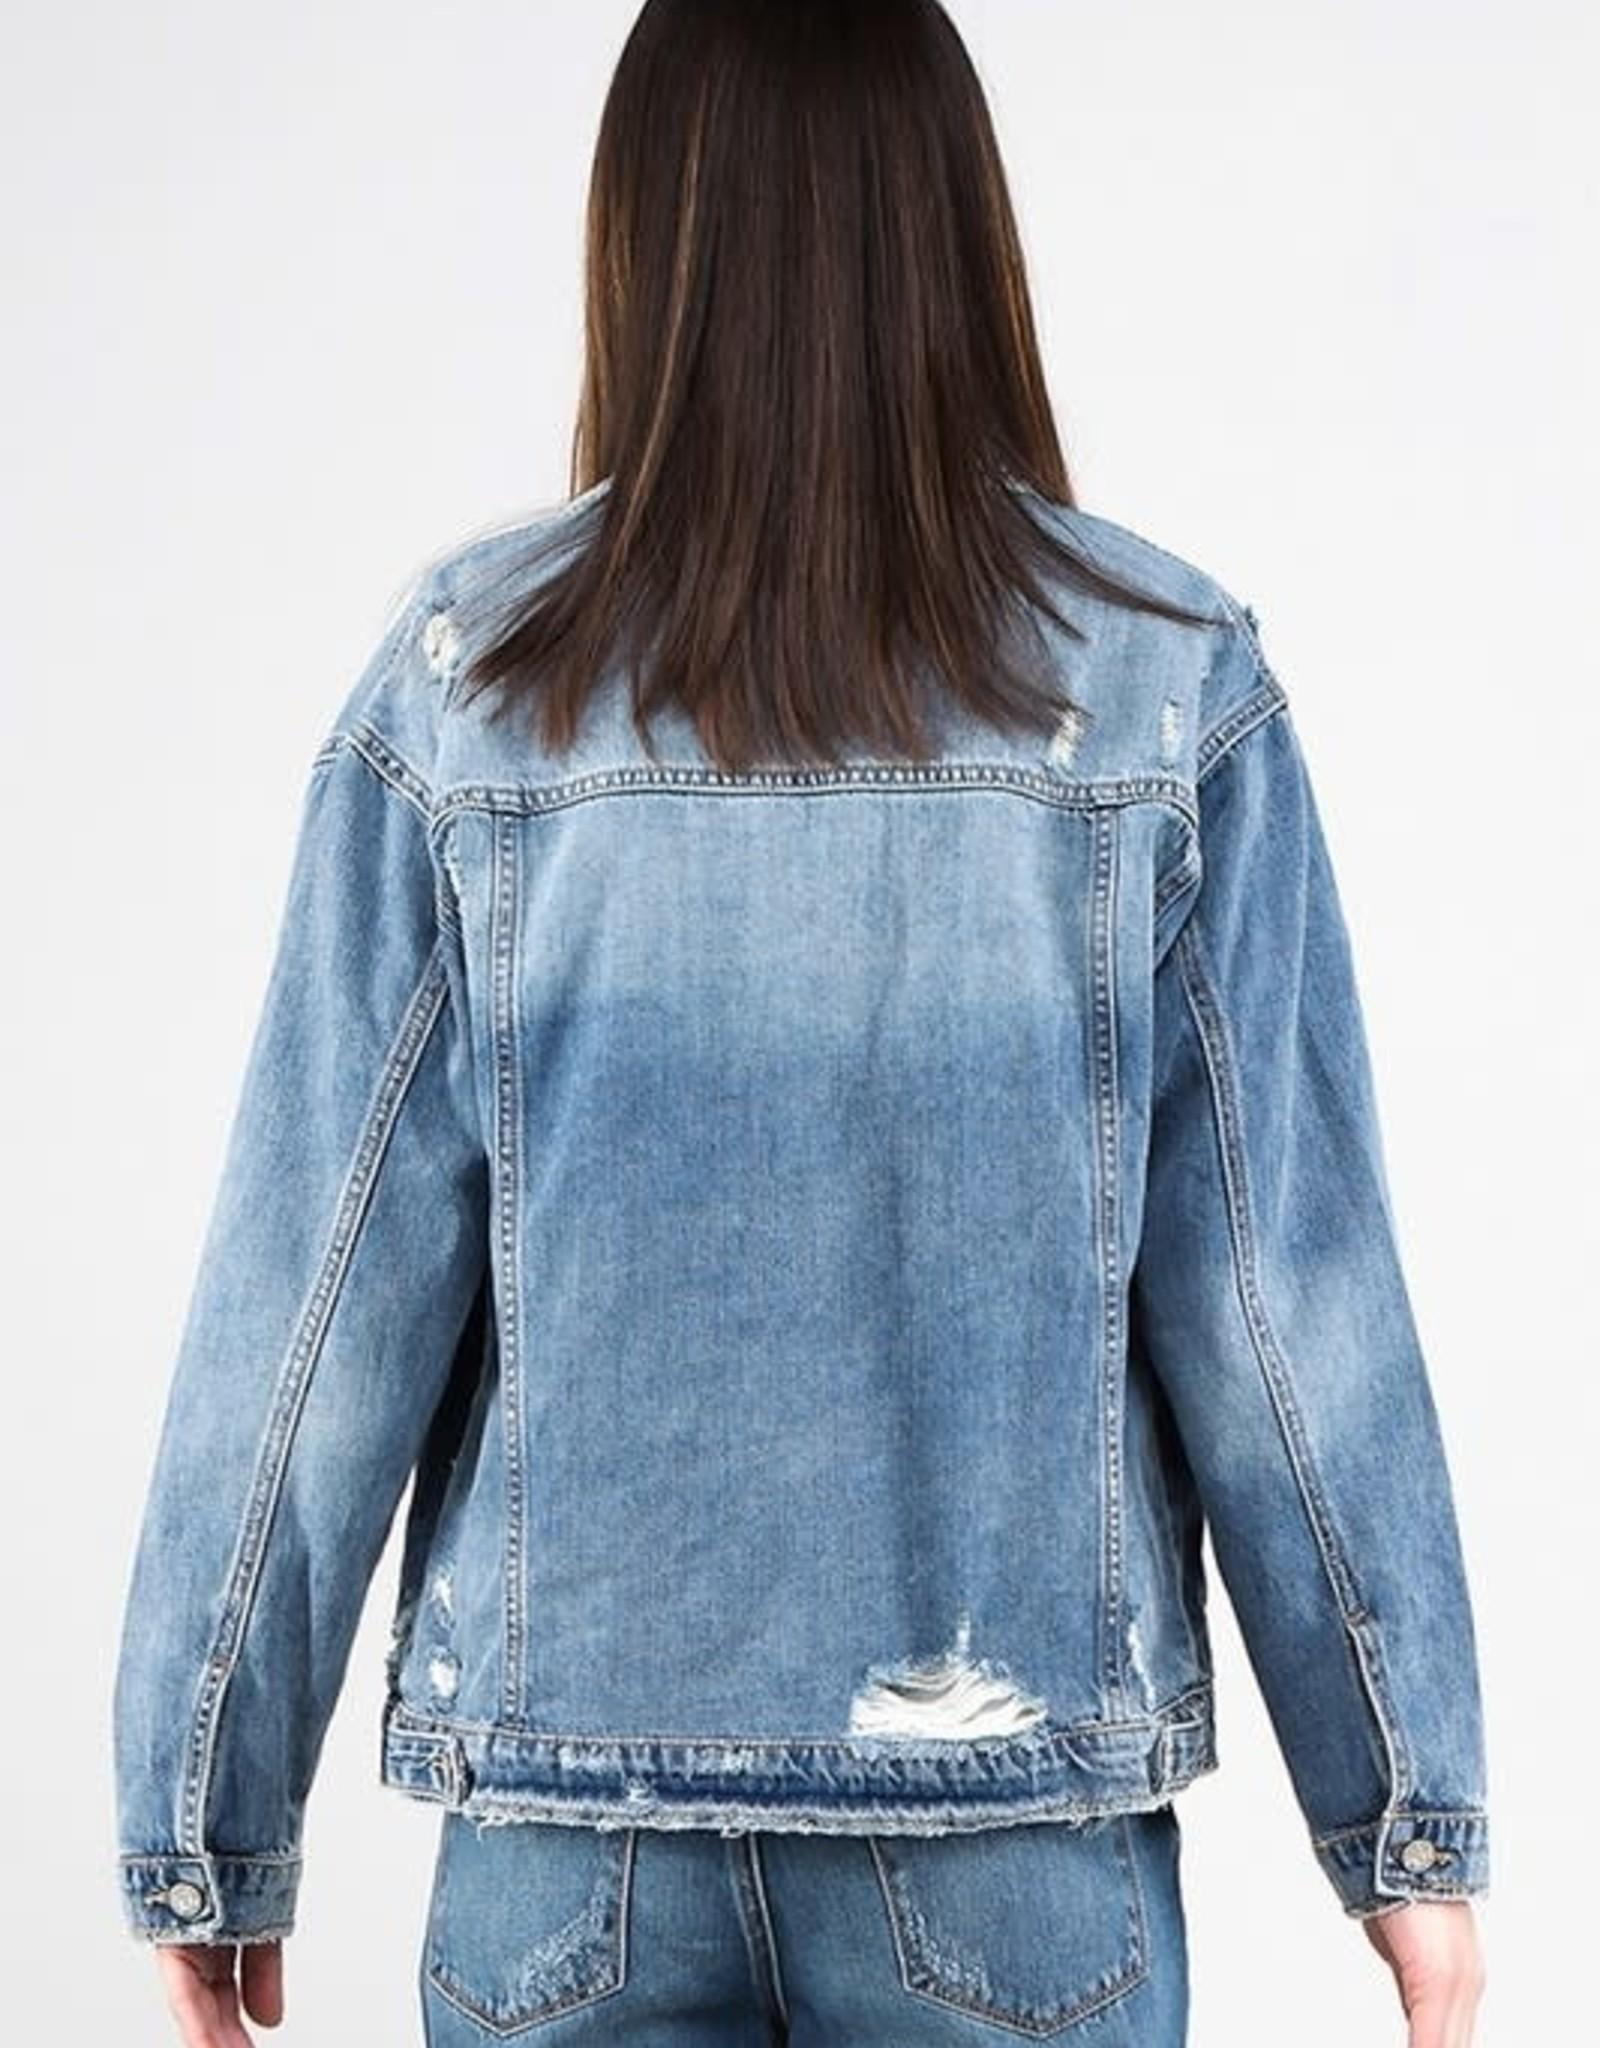 Miss Bliss Premium Oversized Jacket- Denim